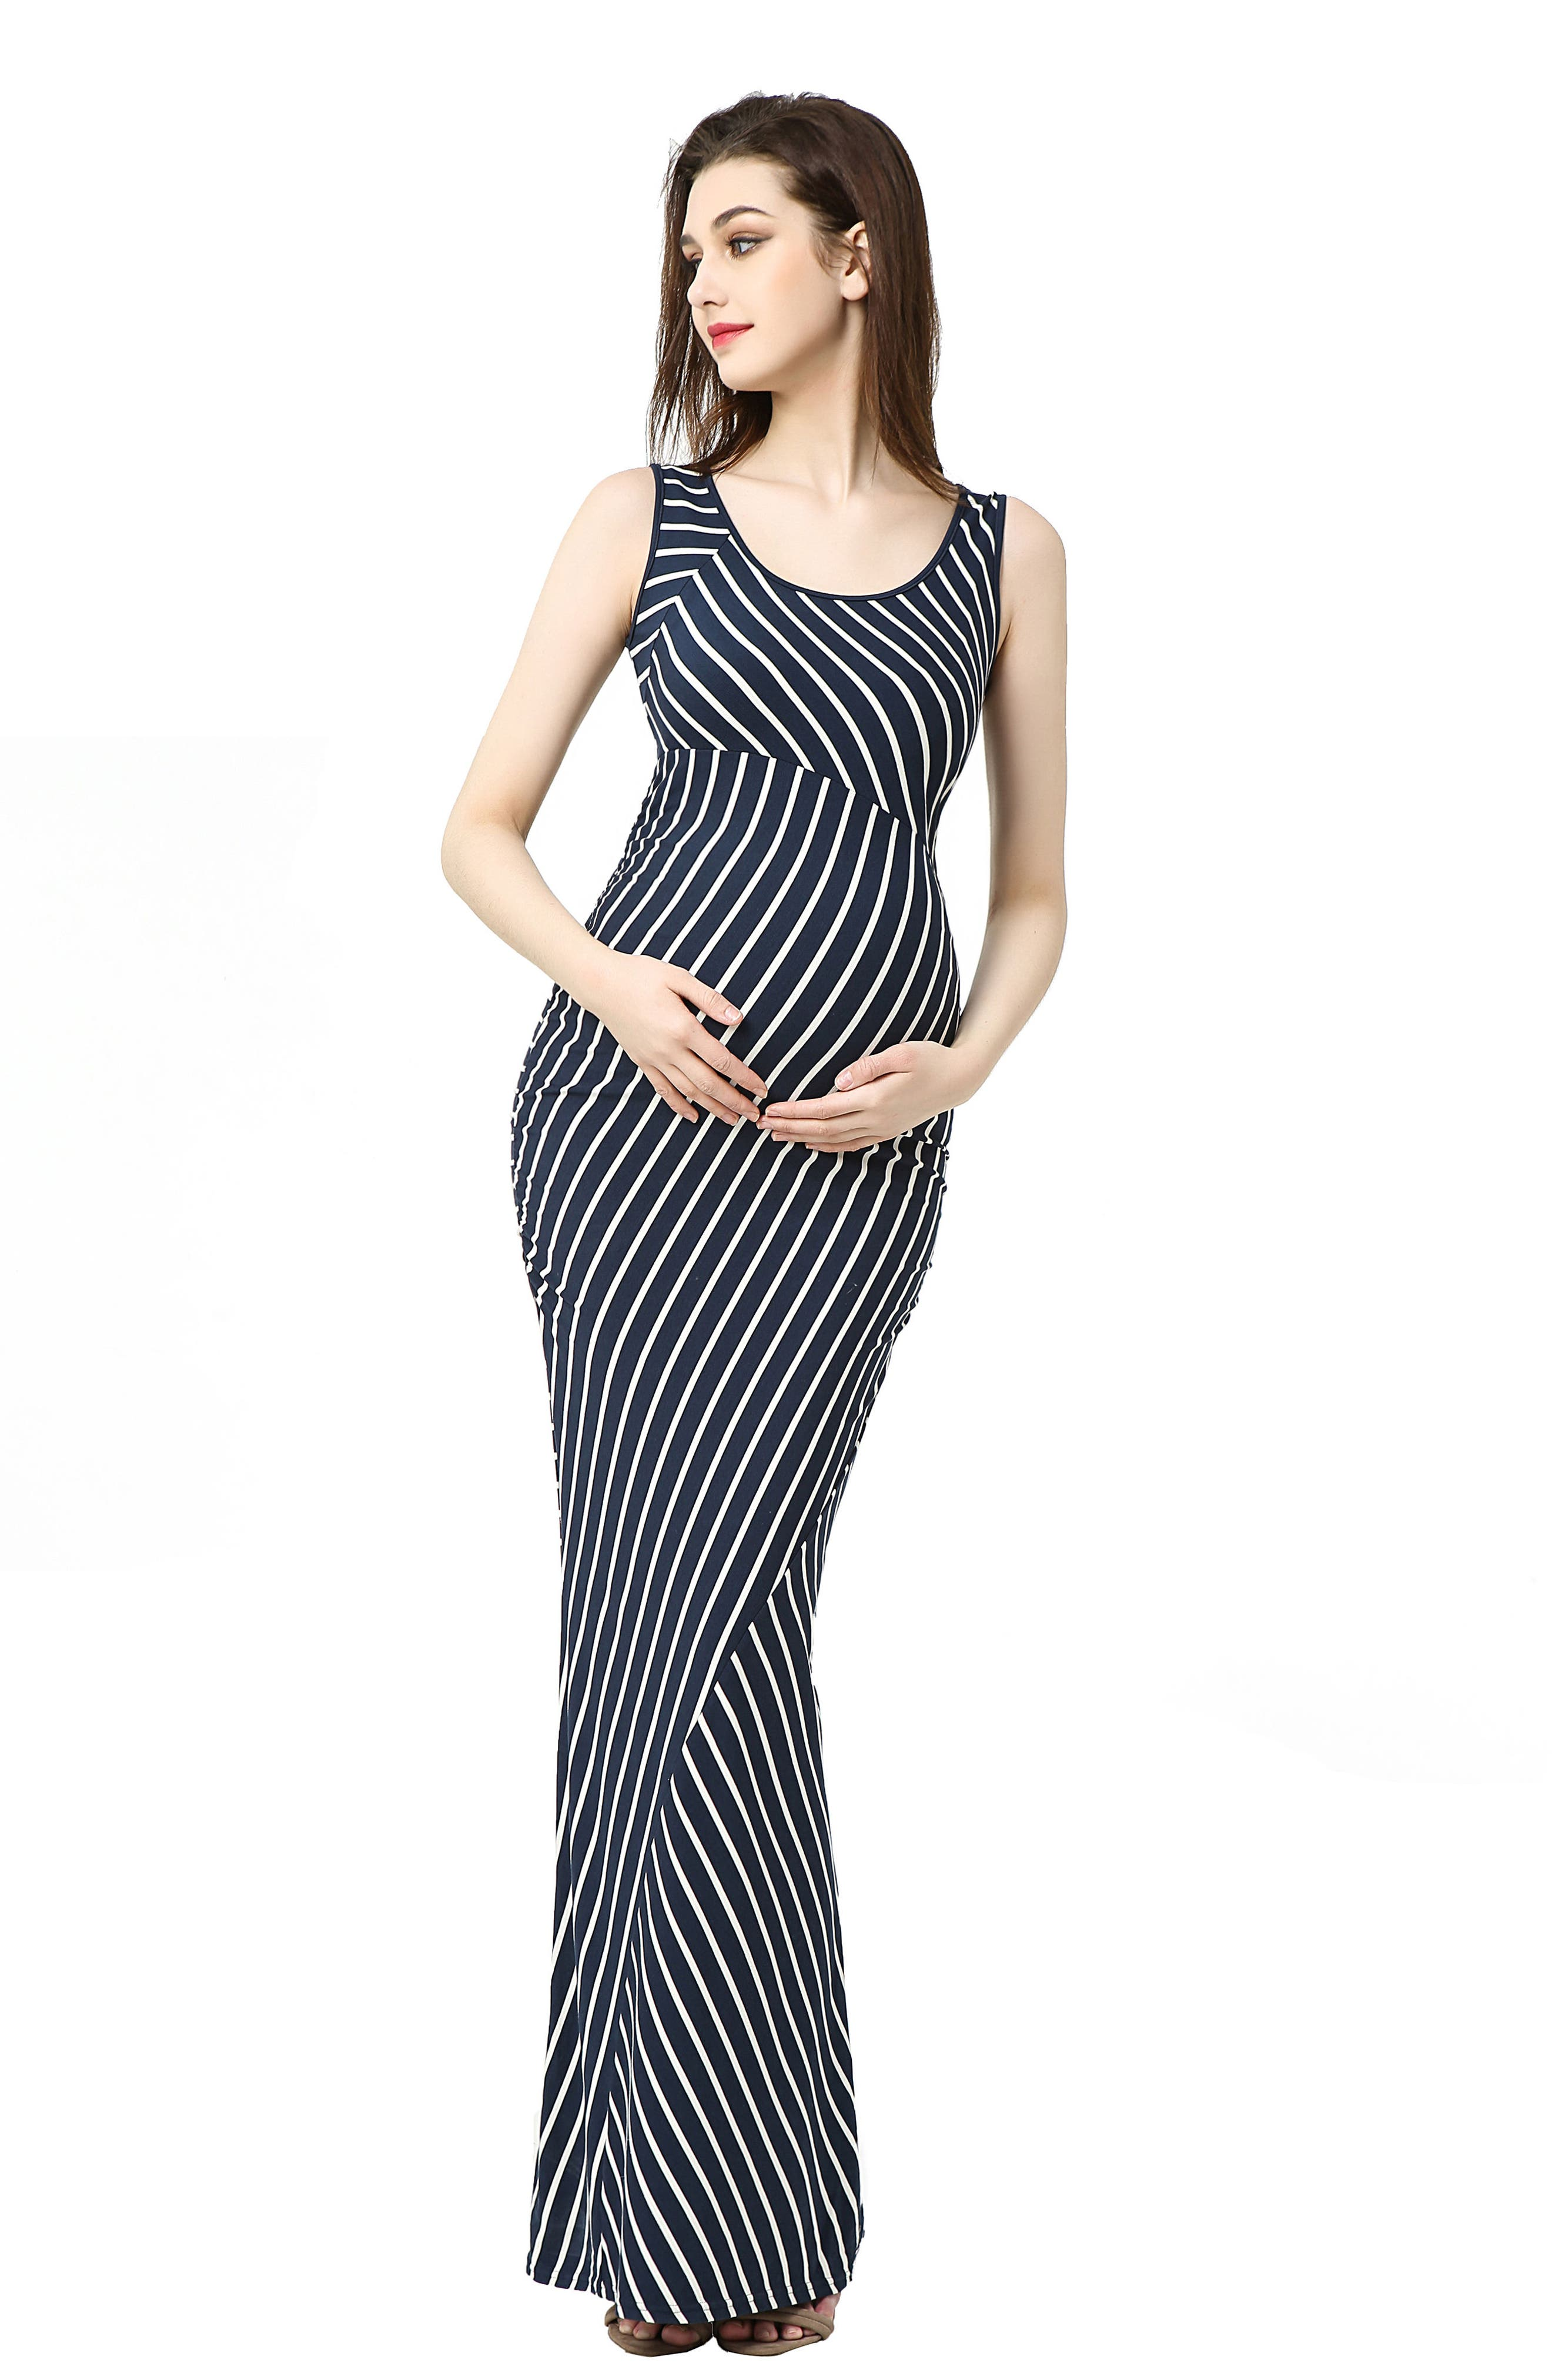 Peyton Stripe Maxi Maternity Dress,                             Alternate thumbnail 4, color,                             NAVY/ IVORY